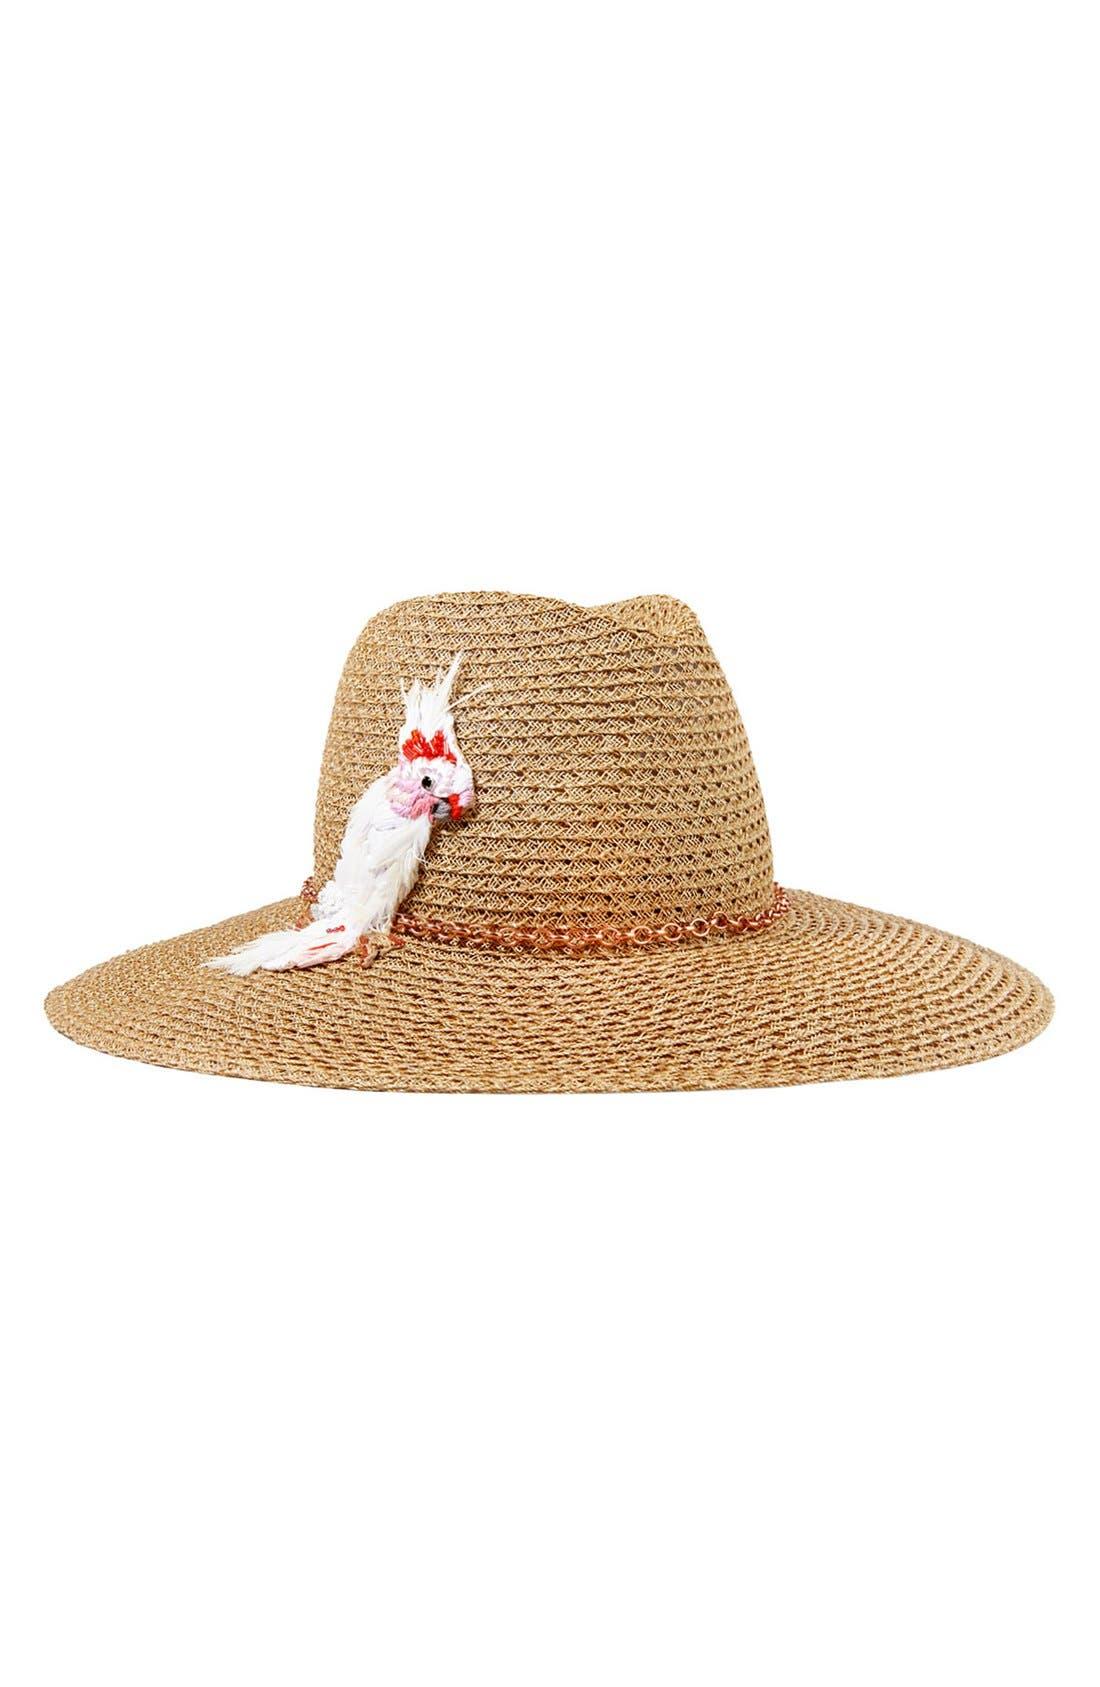 'Emmanuelle' Cockatoo Ornament Straw Hat,                             Alternate thumbnail 2, color,                             250